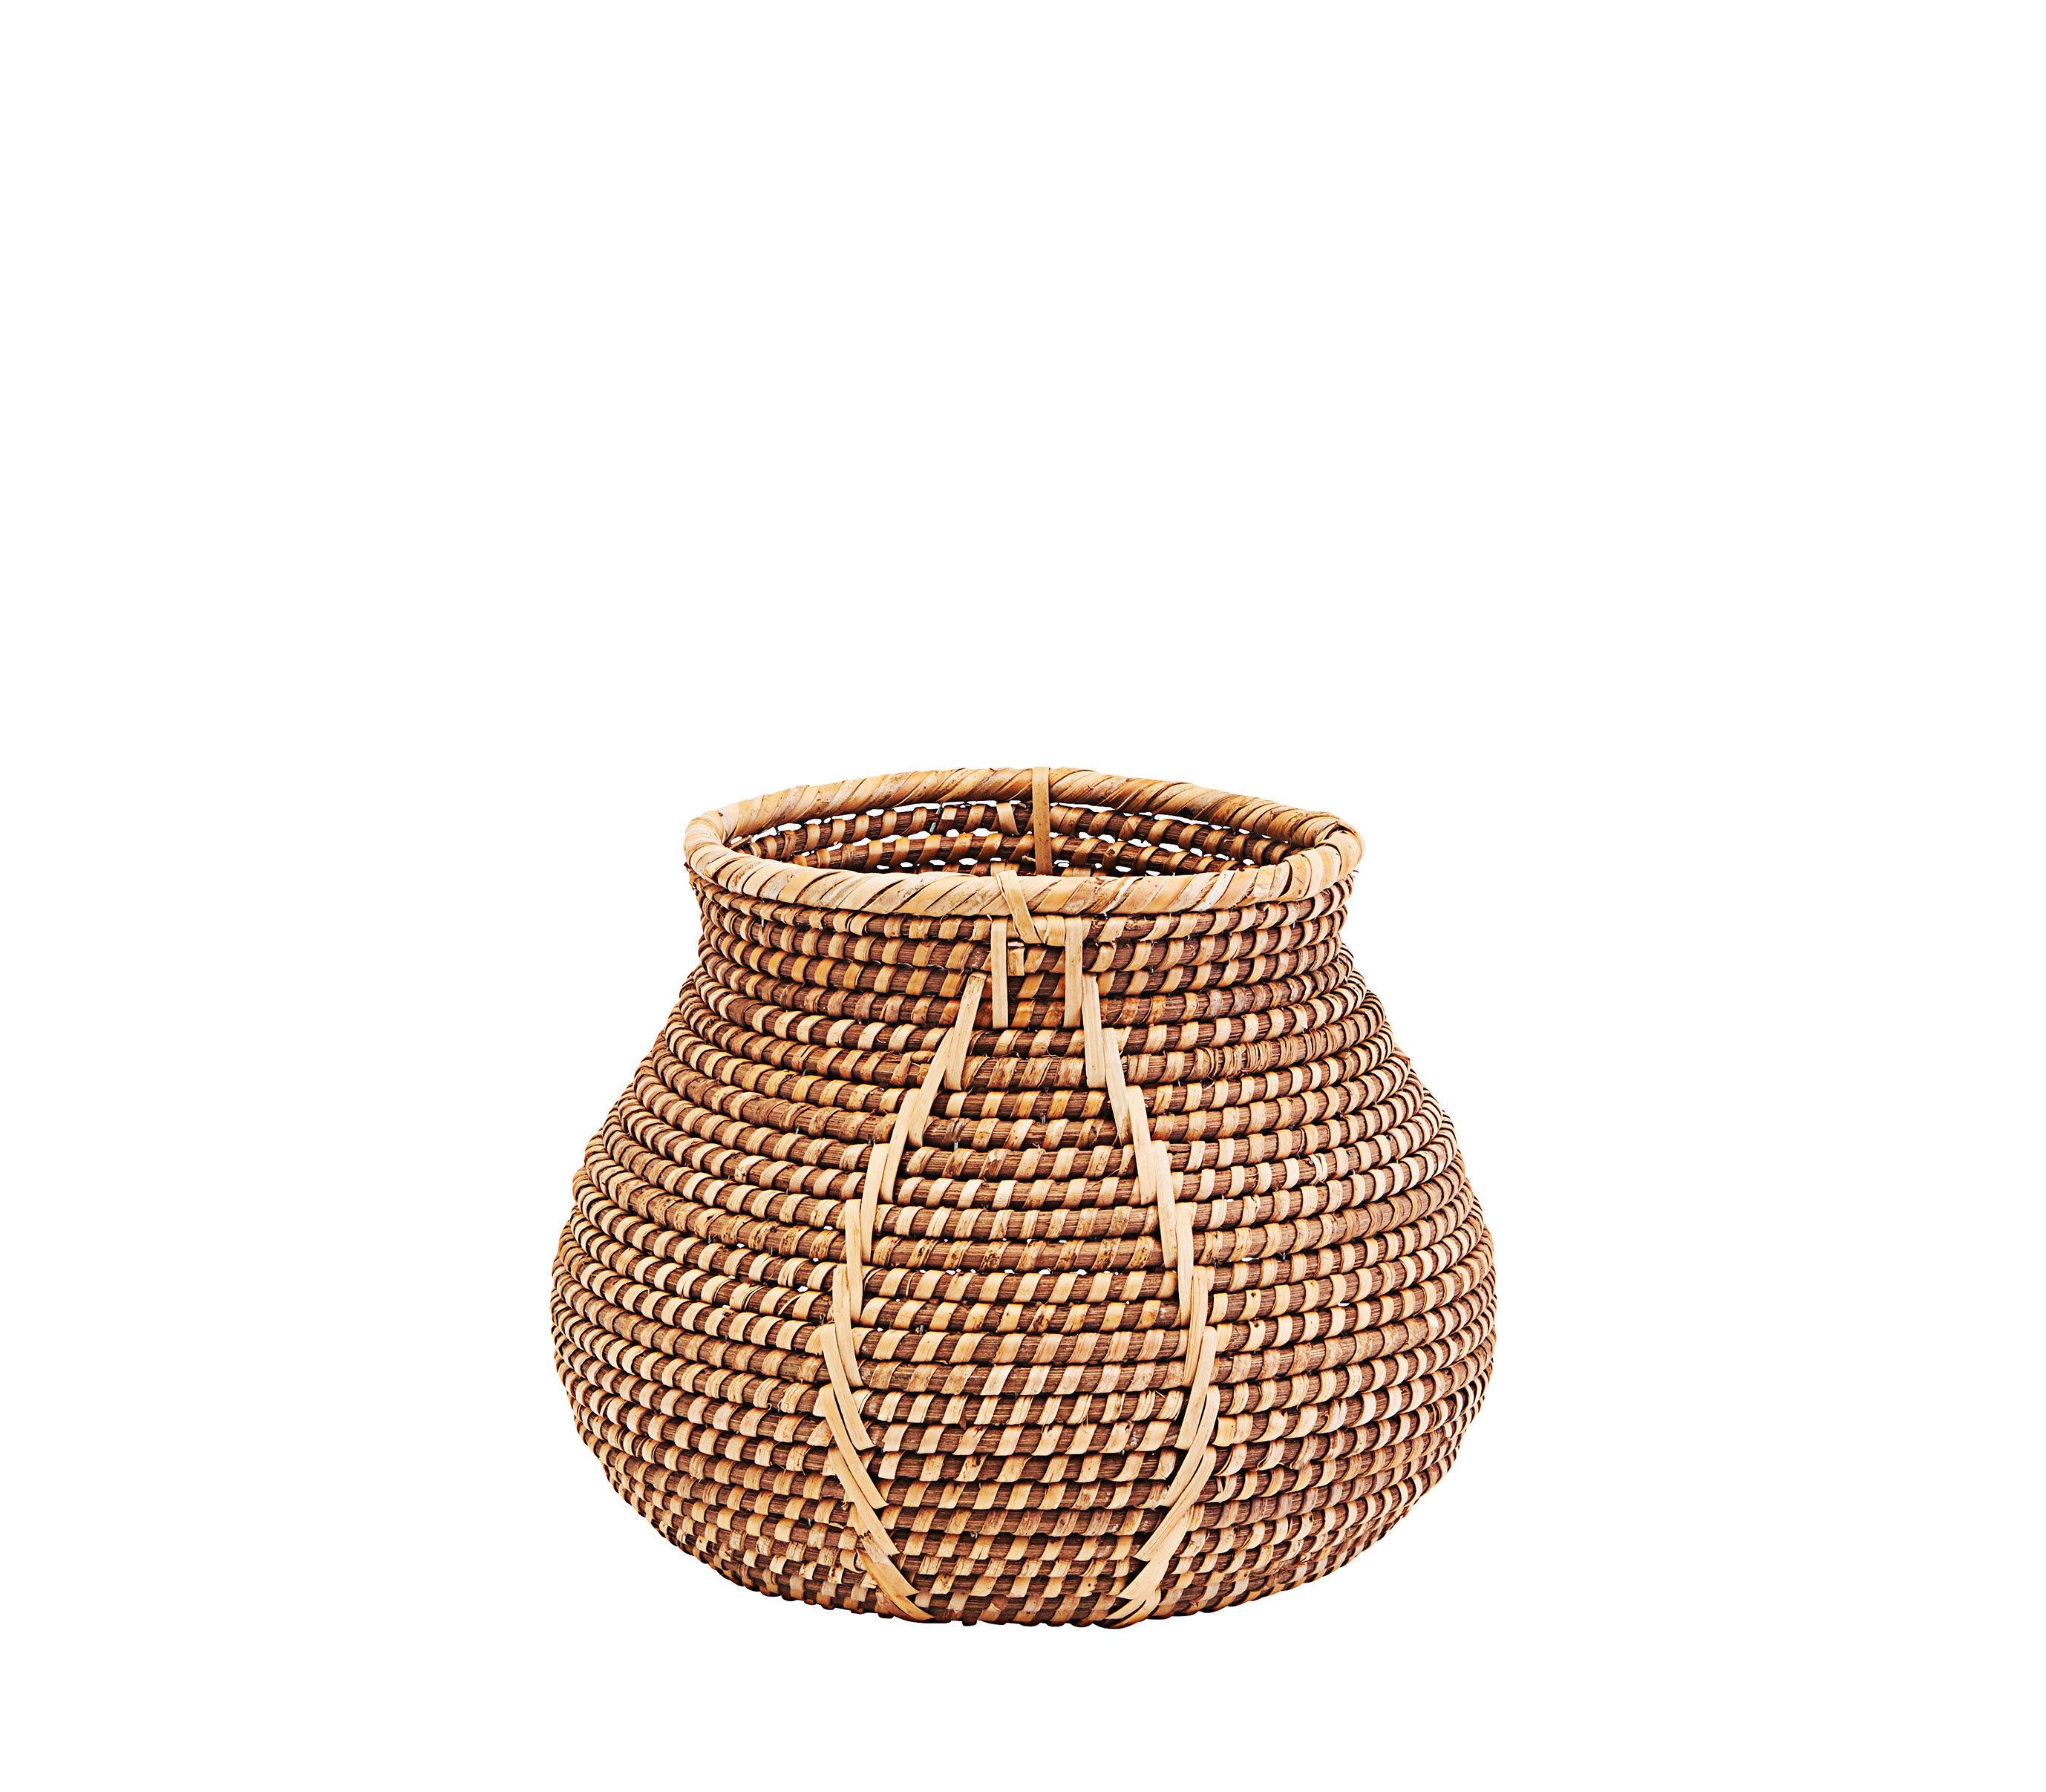 Decoration - Boxes & Baskets - Azeema Basket - / Rattan - Ø 28 x H 21 cm by House Doctor - Ø 28 x H 21 cm / Rattan - Rattan